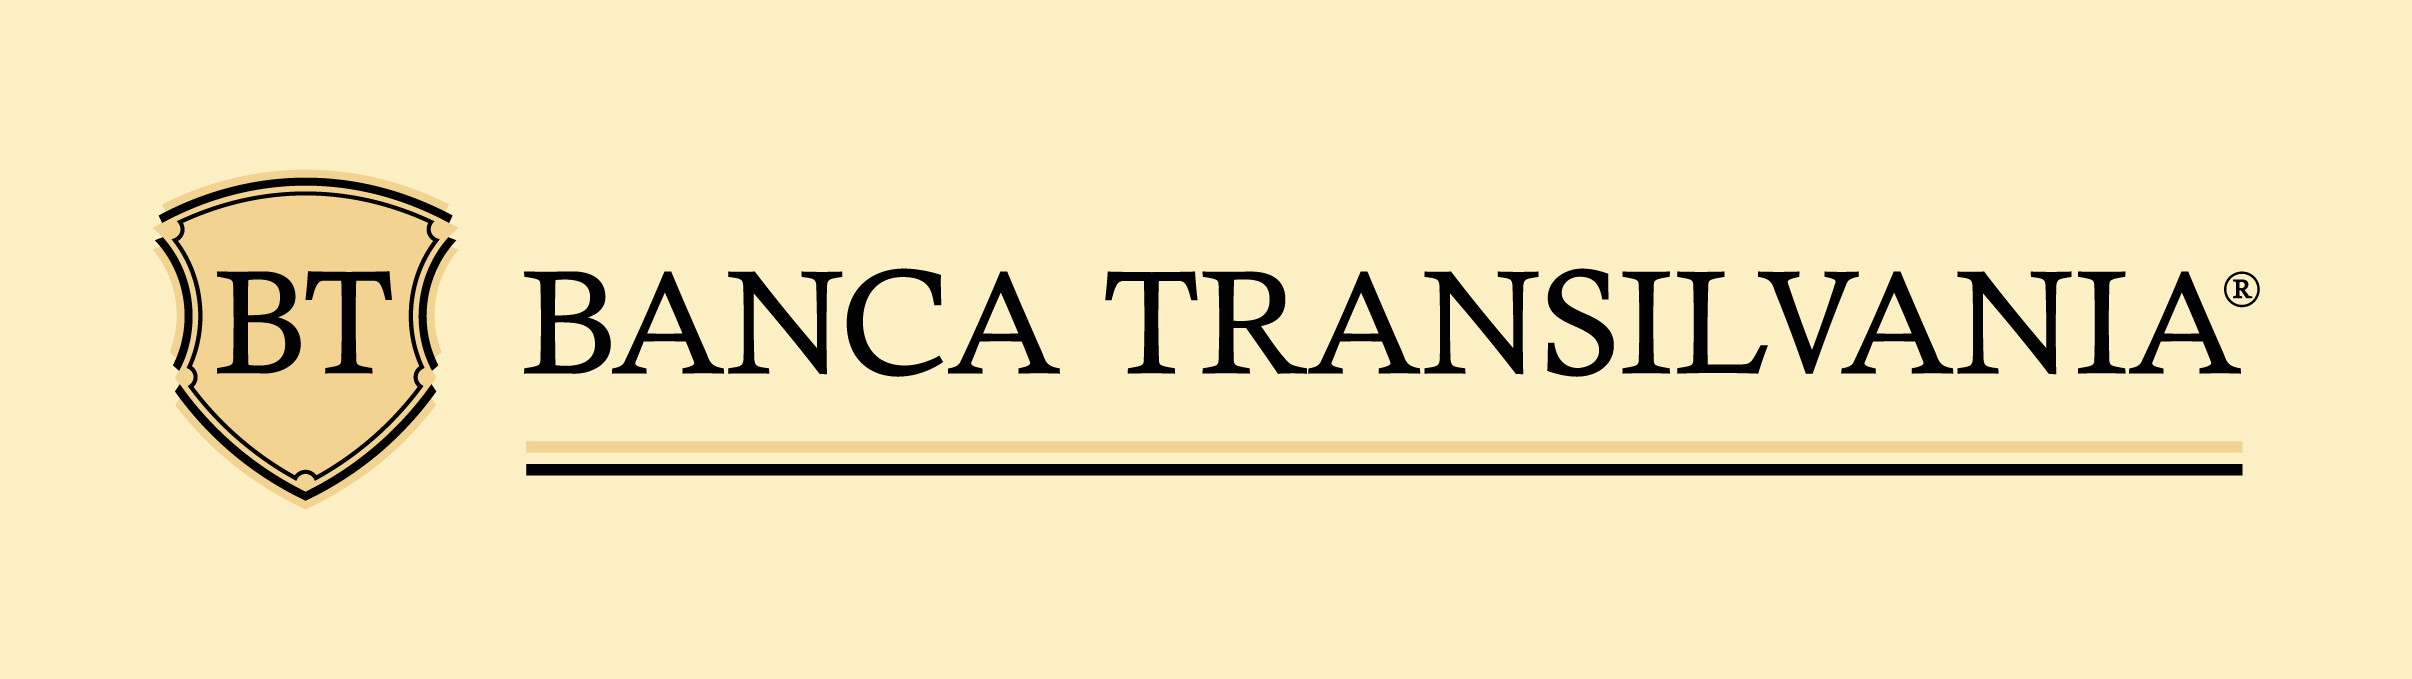 Actionarii Bancii Transilvania au aprobat fuziunea  Volksbank Romania cu Banca Transilvania